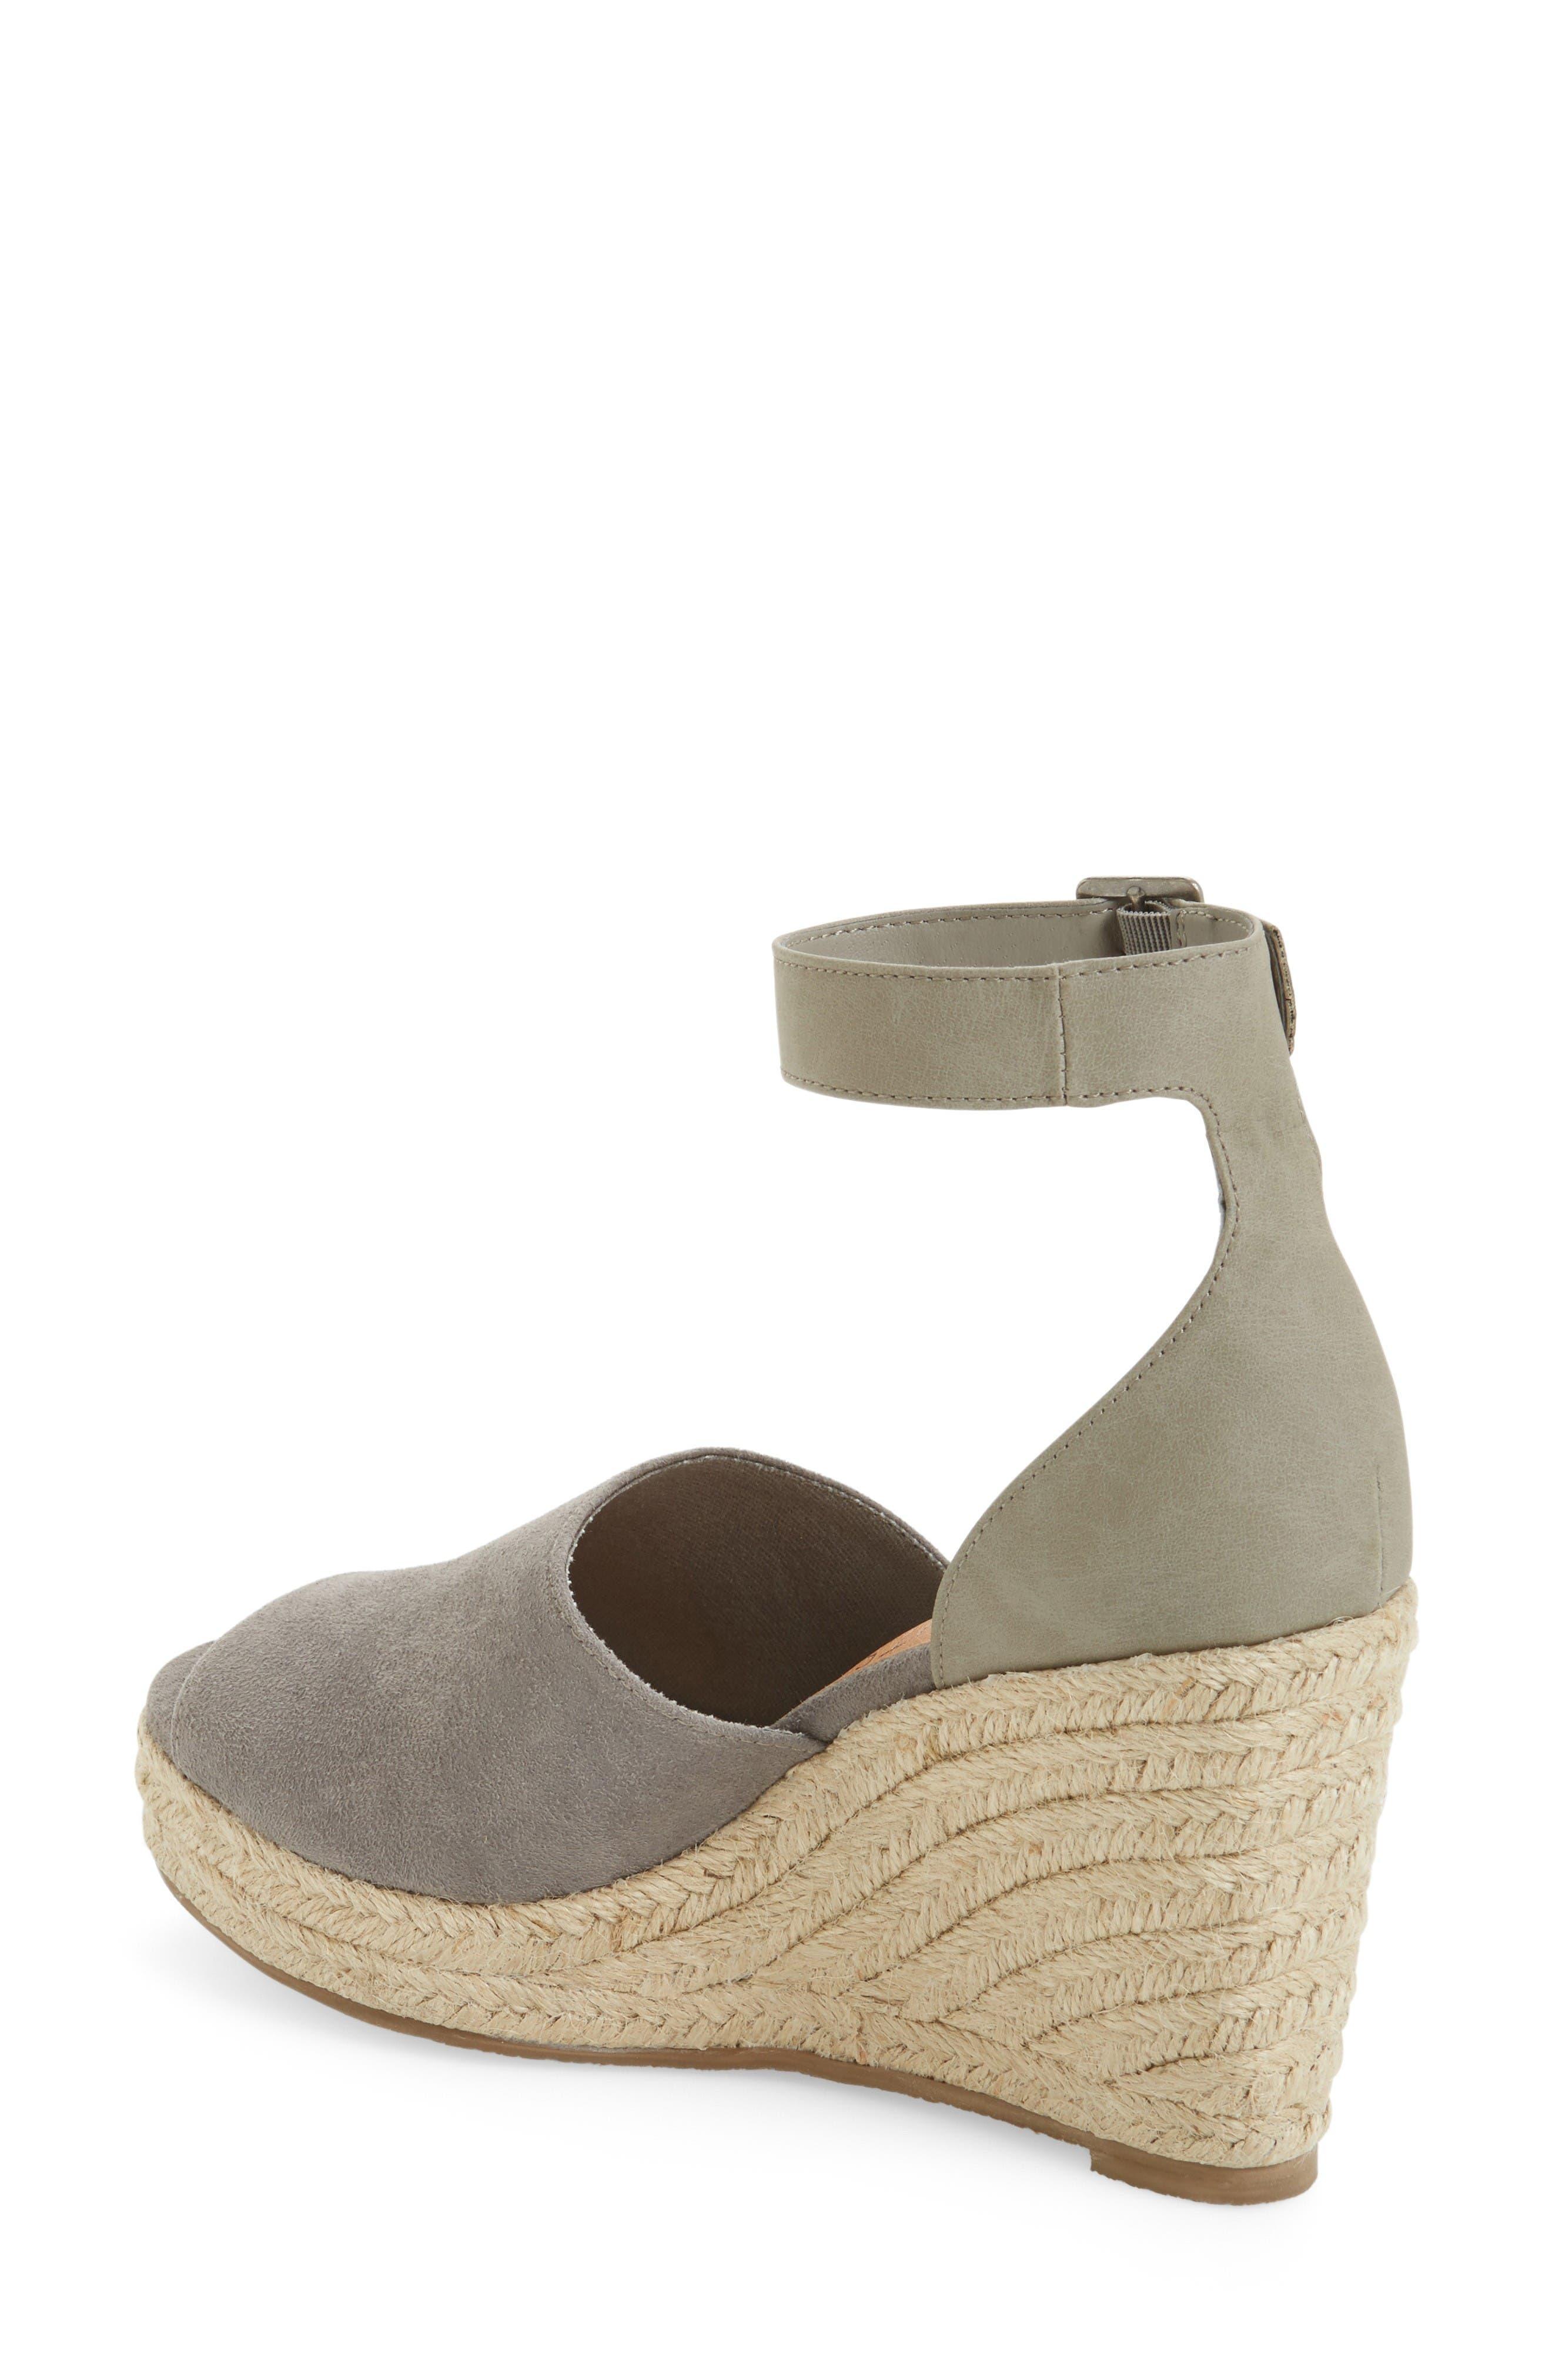 Flamingo Wedge Sandal,                             Alternate thumbnail 2, color,                             Grey Leather